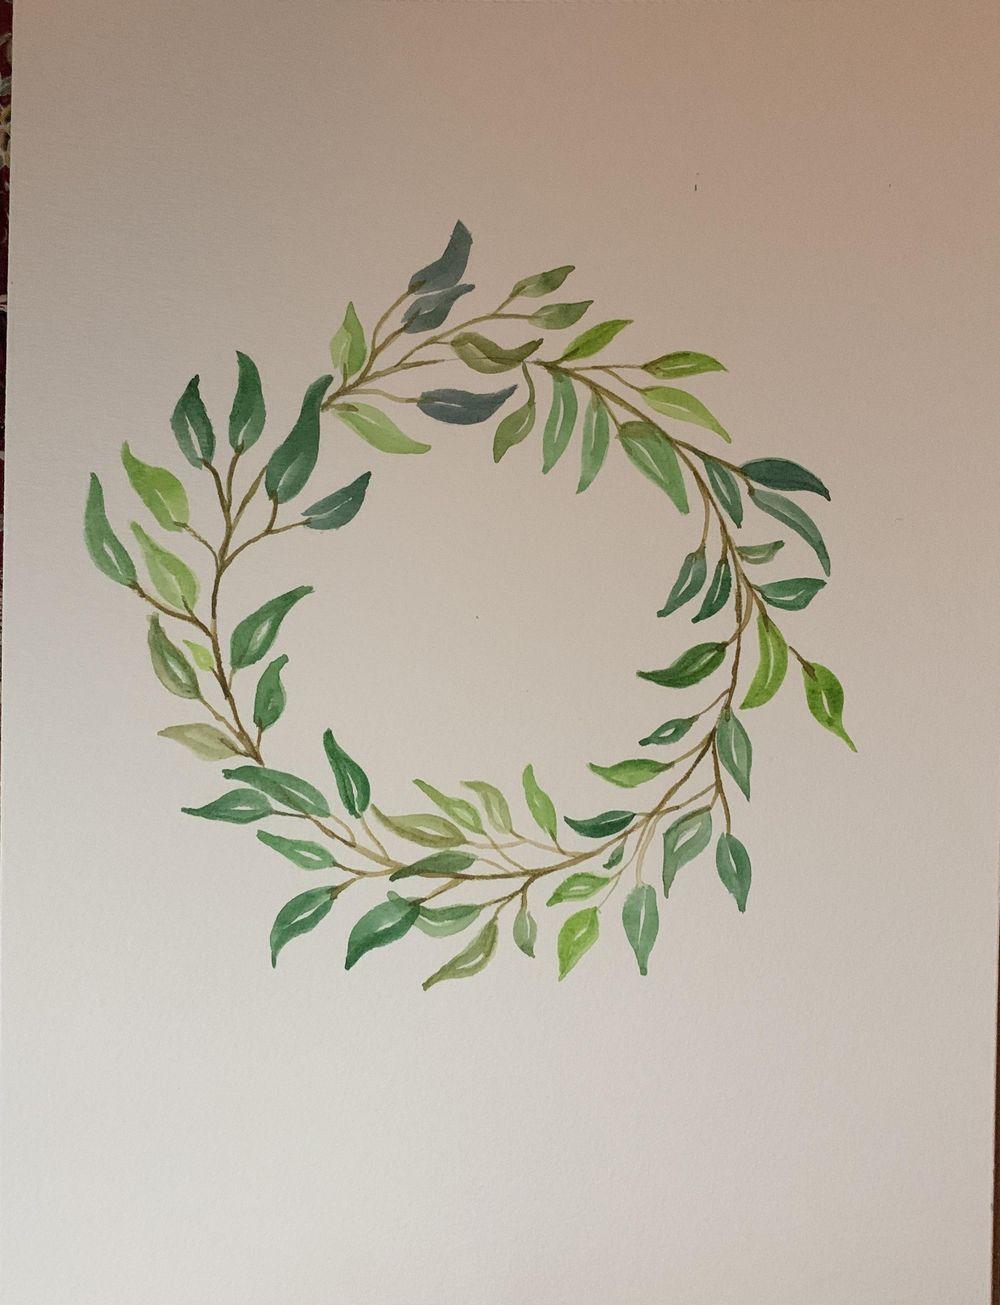 Corona de hojas - image 2 - student project